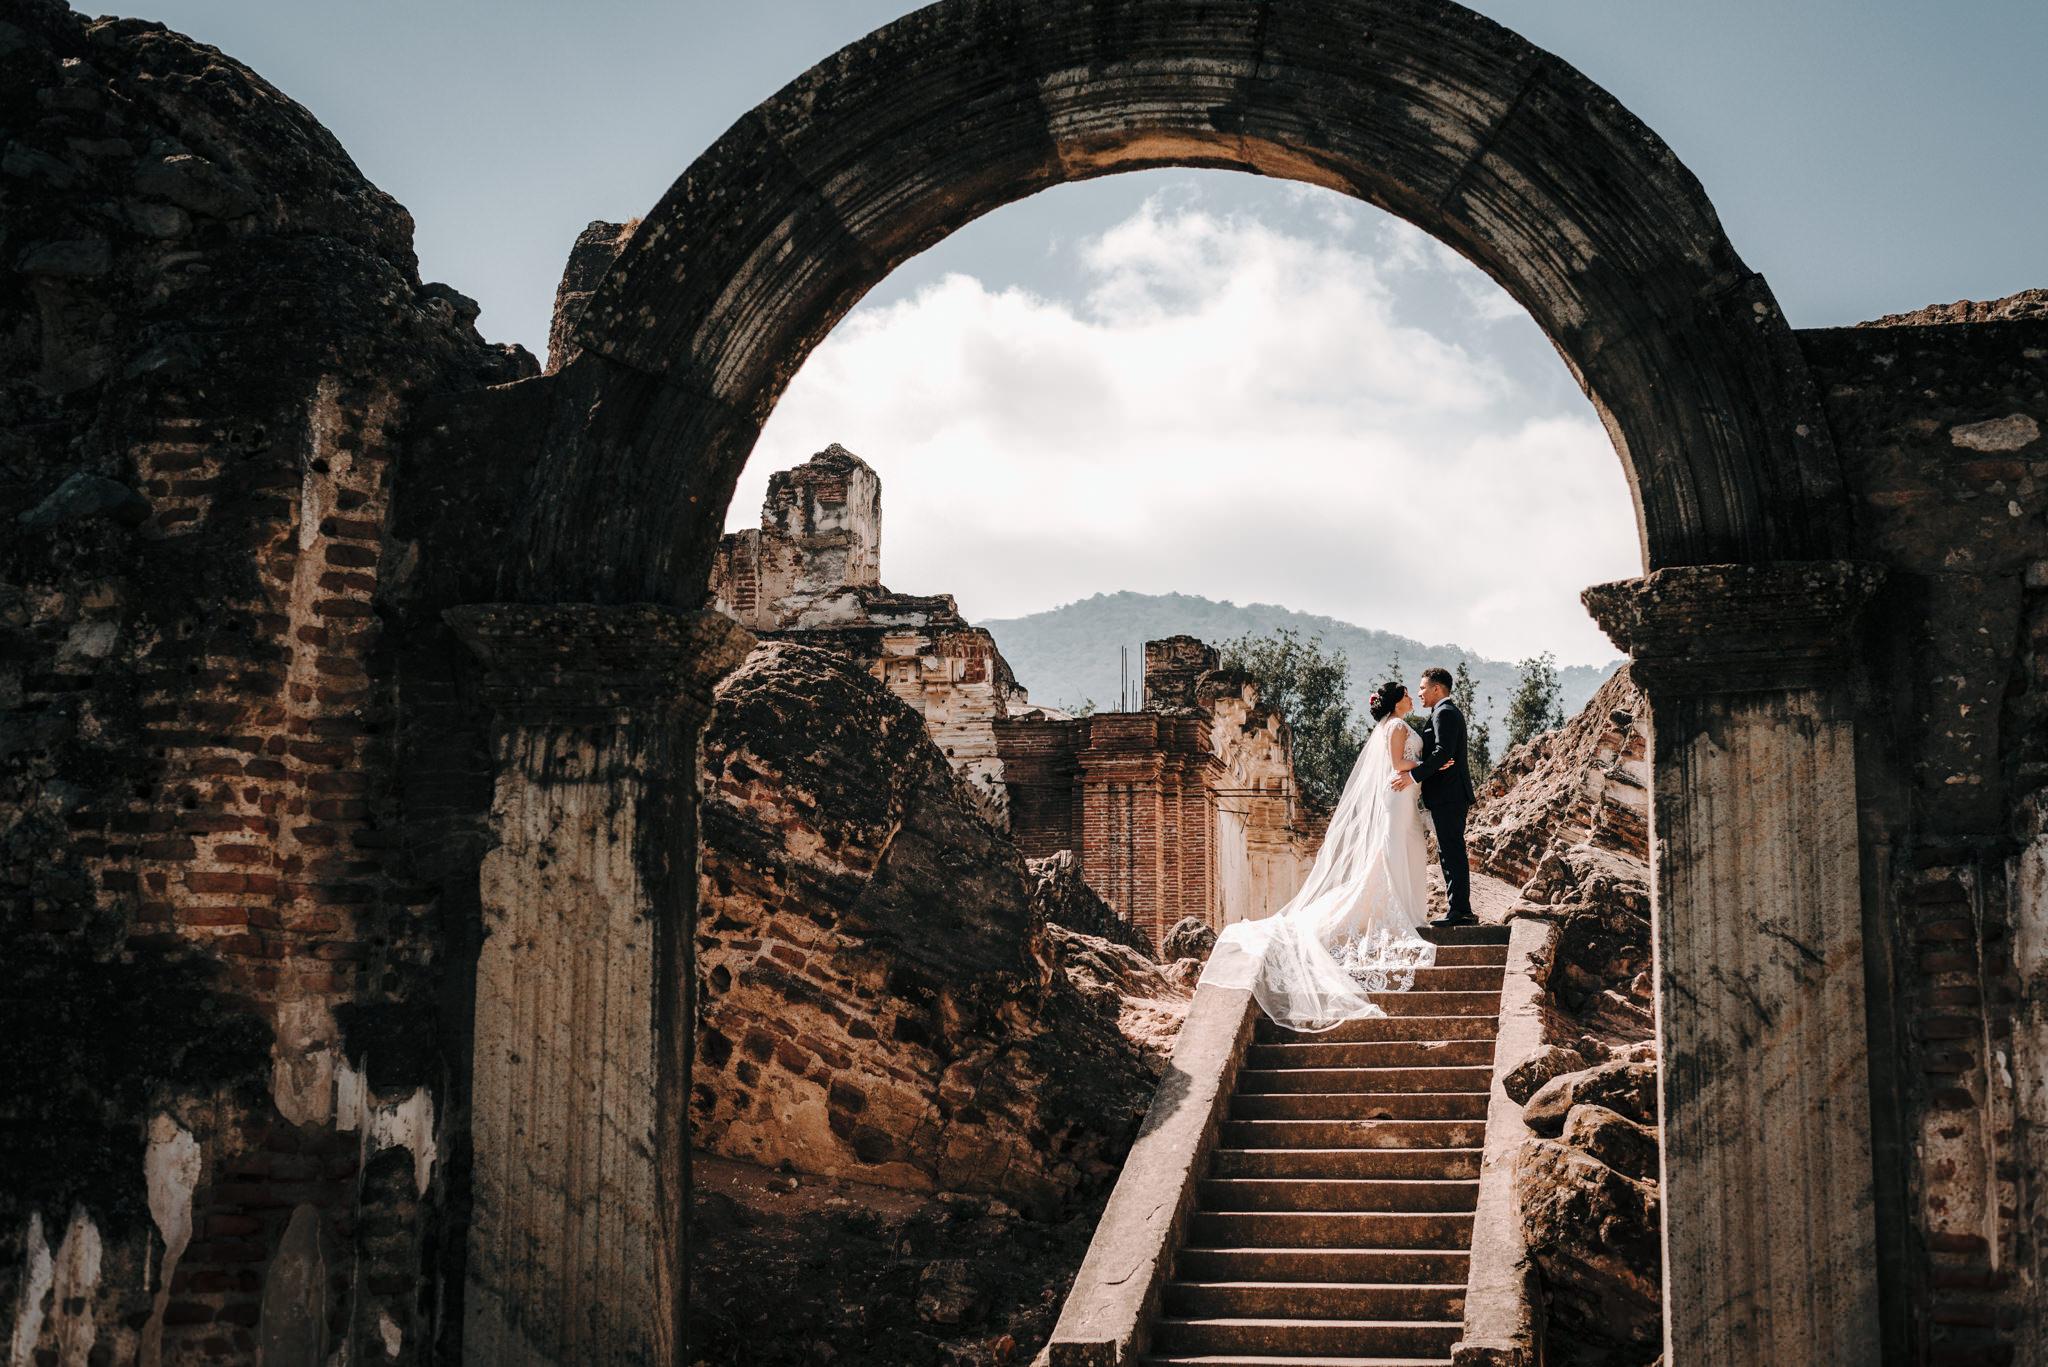 Boda en Antigua Guatemala, Santa Clara – Ronnie y Jess